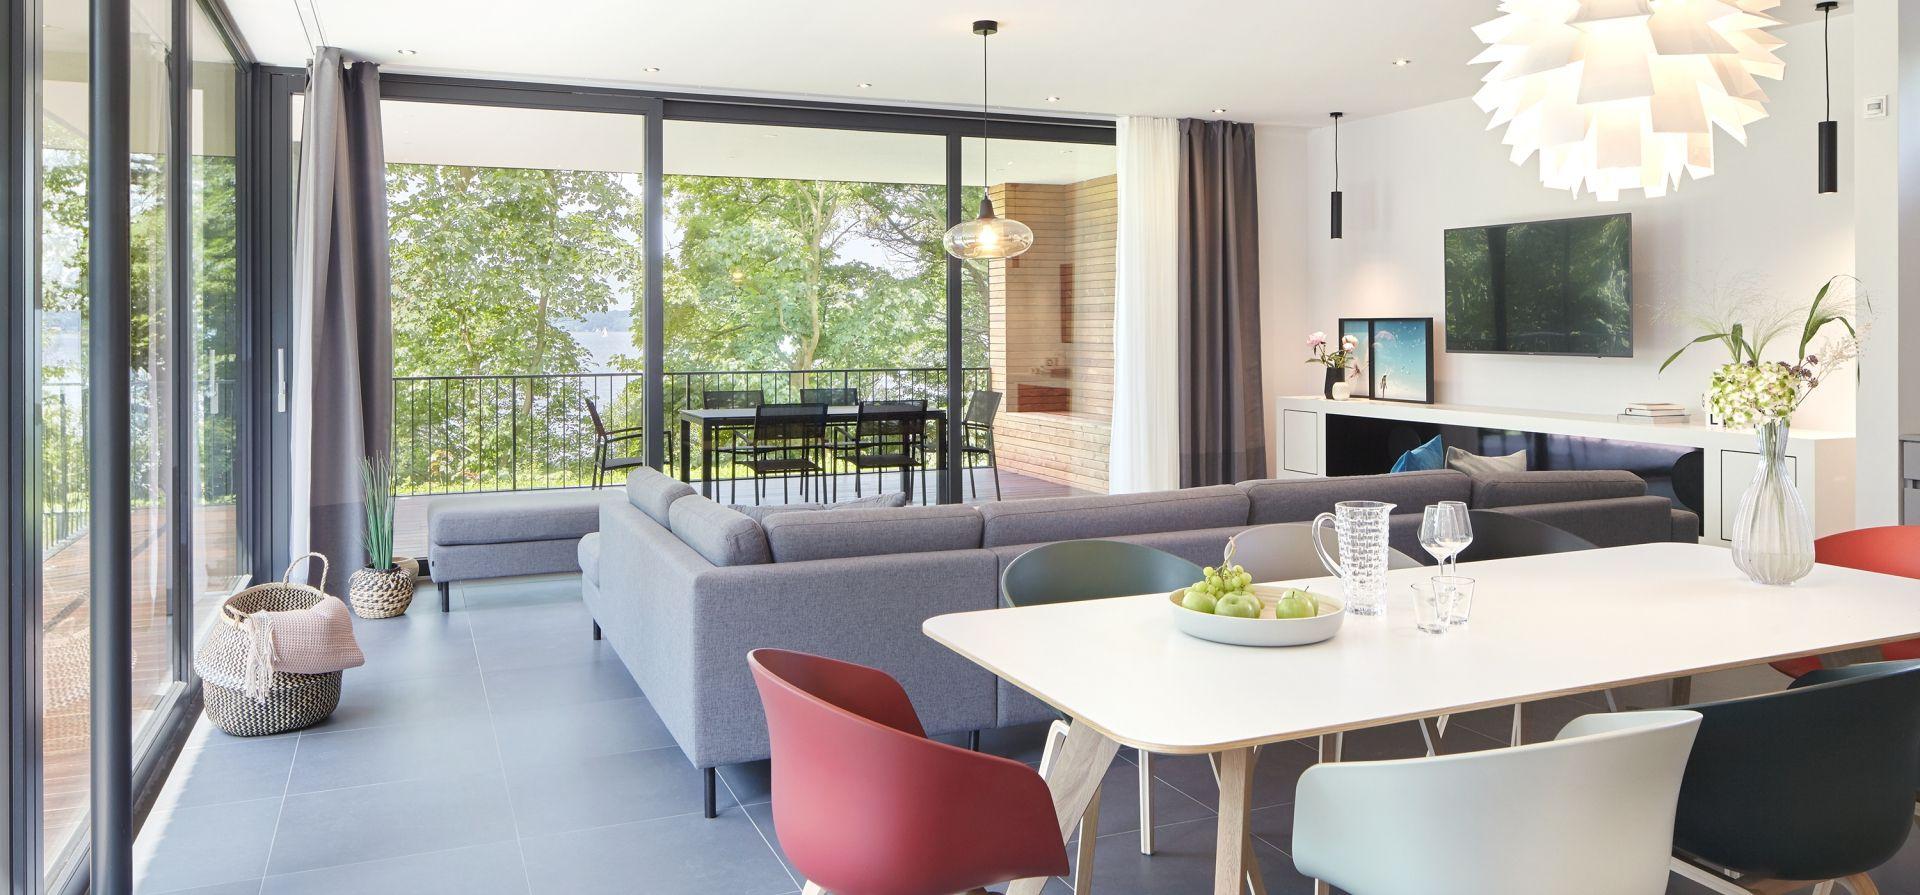 ferienhaus gl cksburg ostsee gl ck in sicht lodges. Black Bedroom Furniture Sets. Home Design Ideas